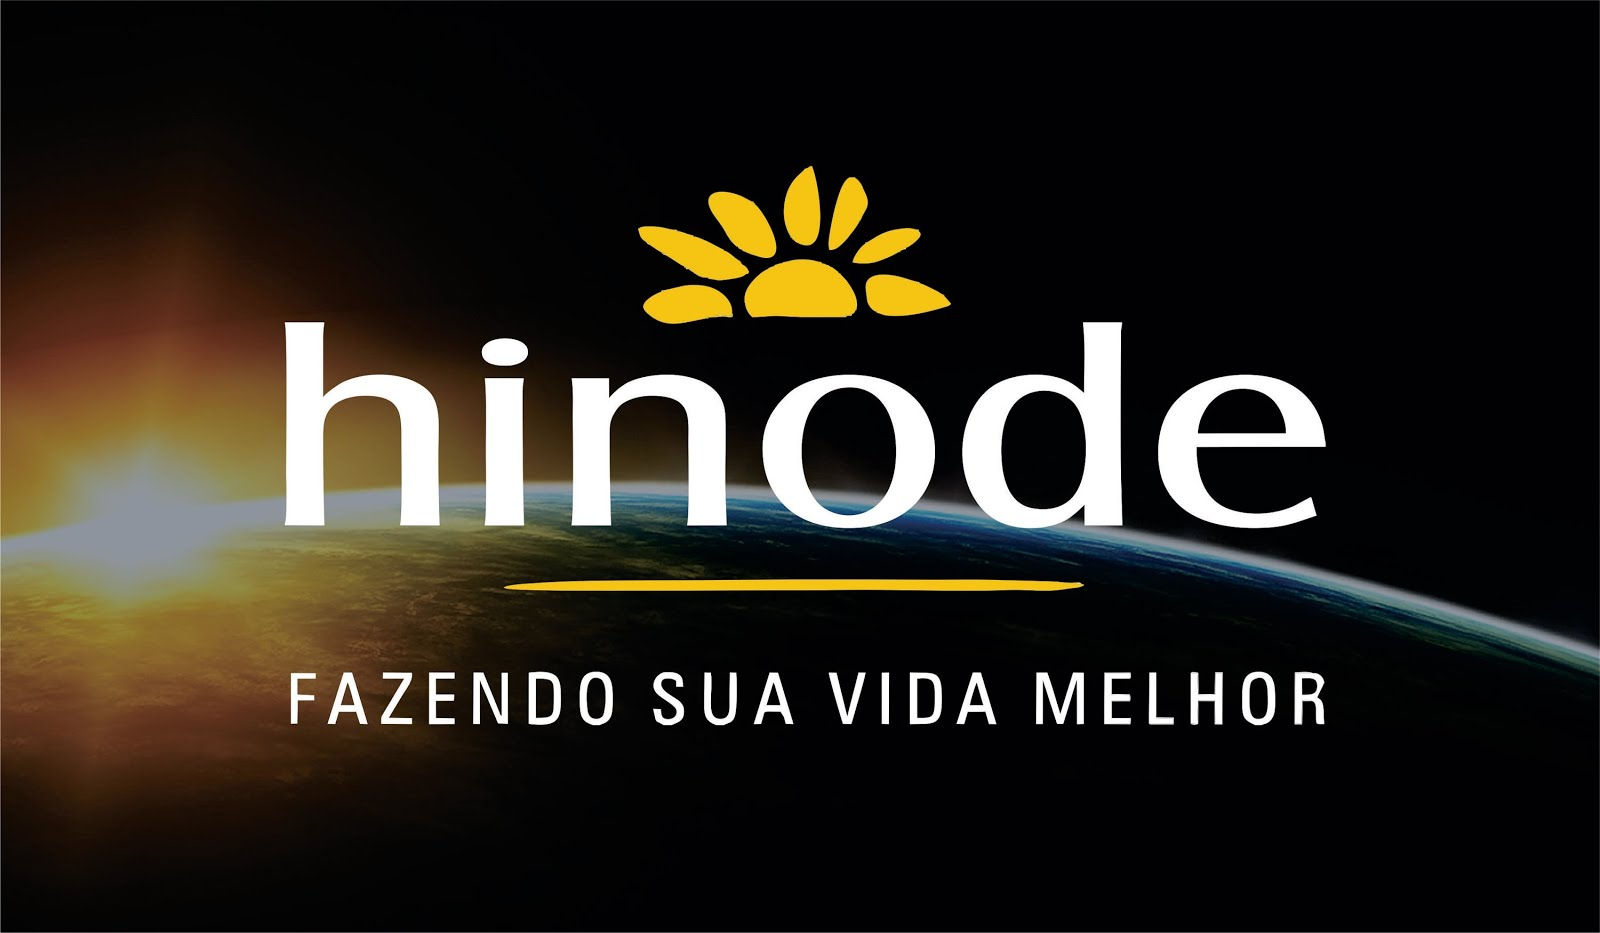 Em Viçosa têm HINODE!